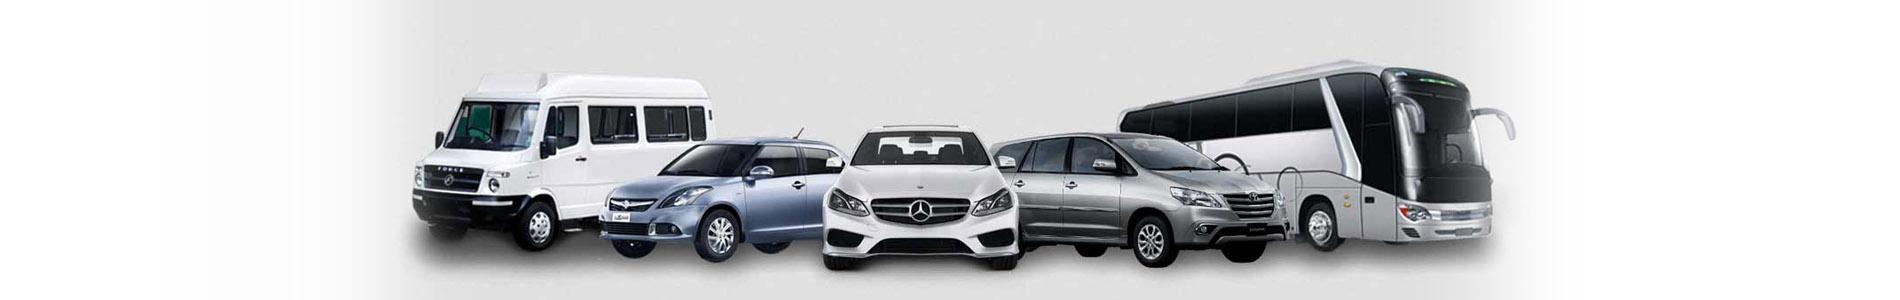 Luxury Car Rental Services Mercedes Benz Bmw X1 Toyota Corolla